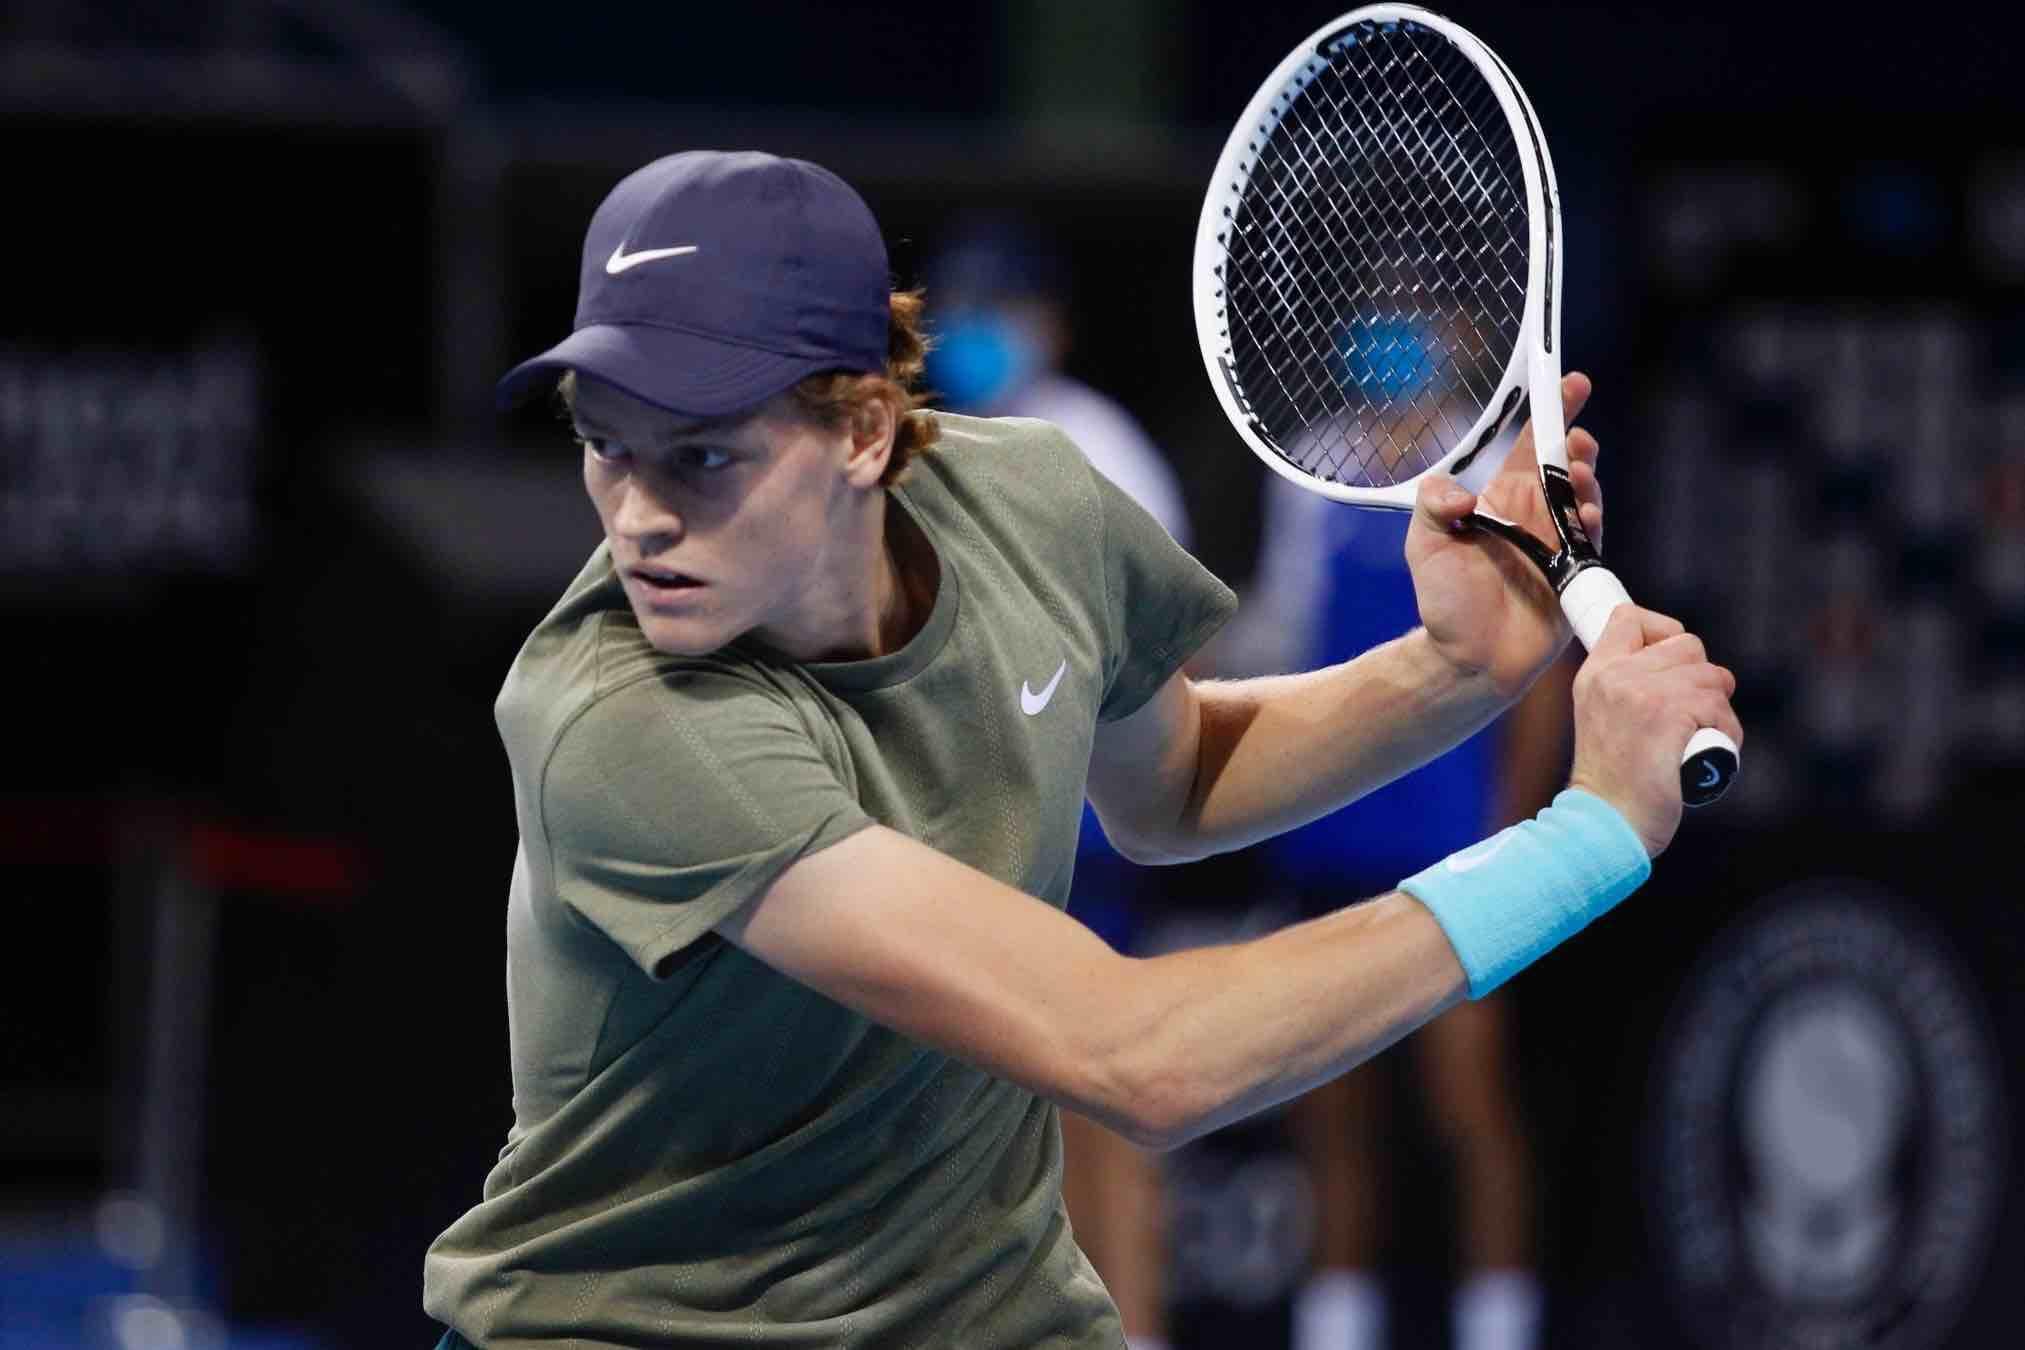 Miami Open 2021: Jannik Sinner vs. Emil Ruusuvuori Tennis Pick and Prediction